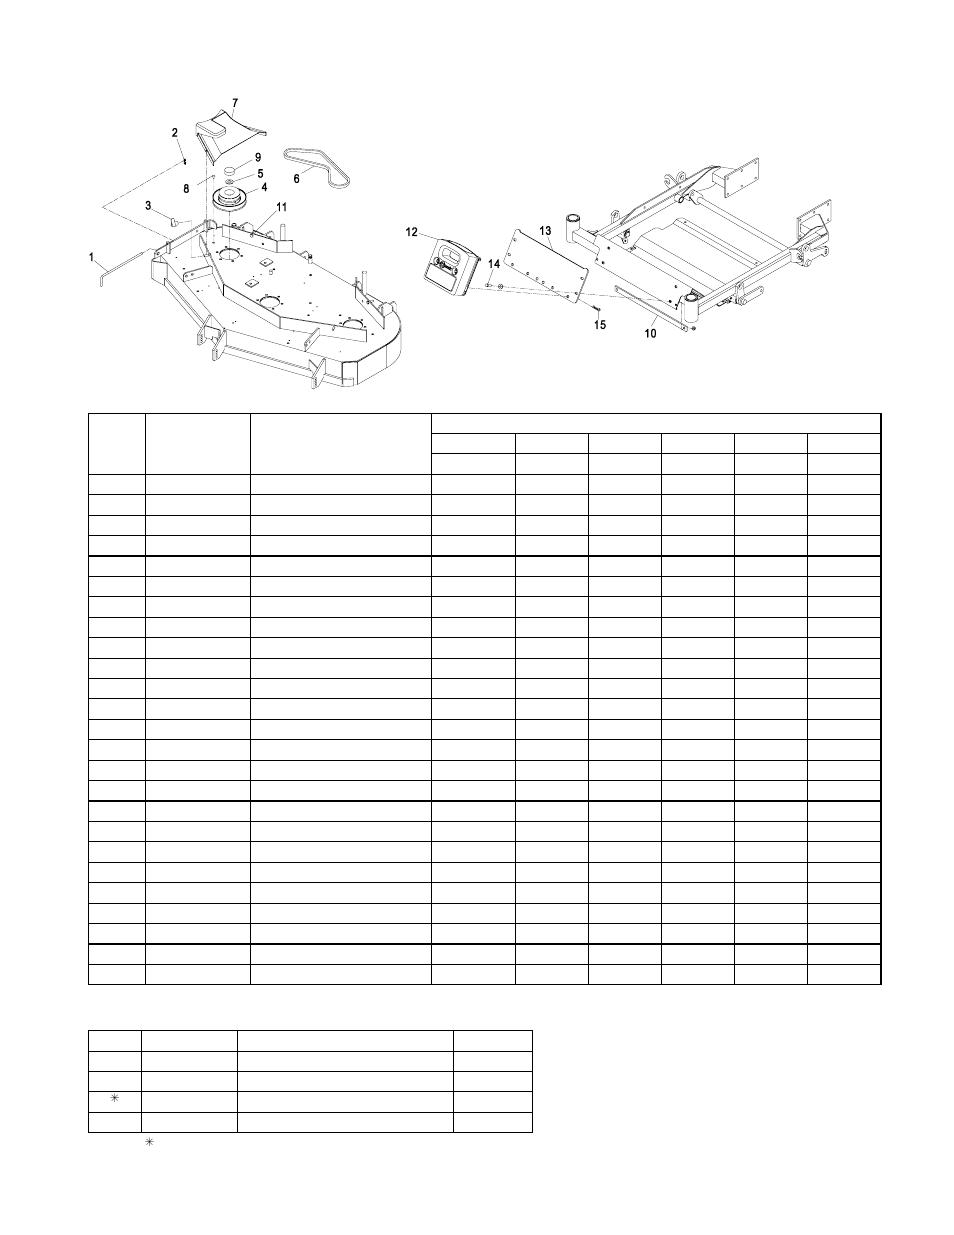 01 44 exmark manual